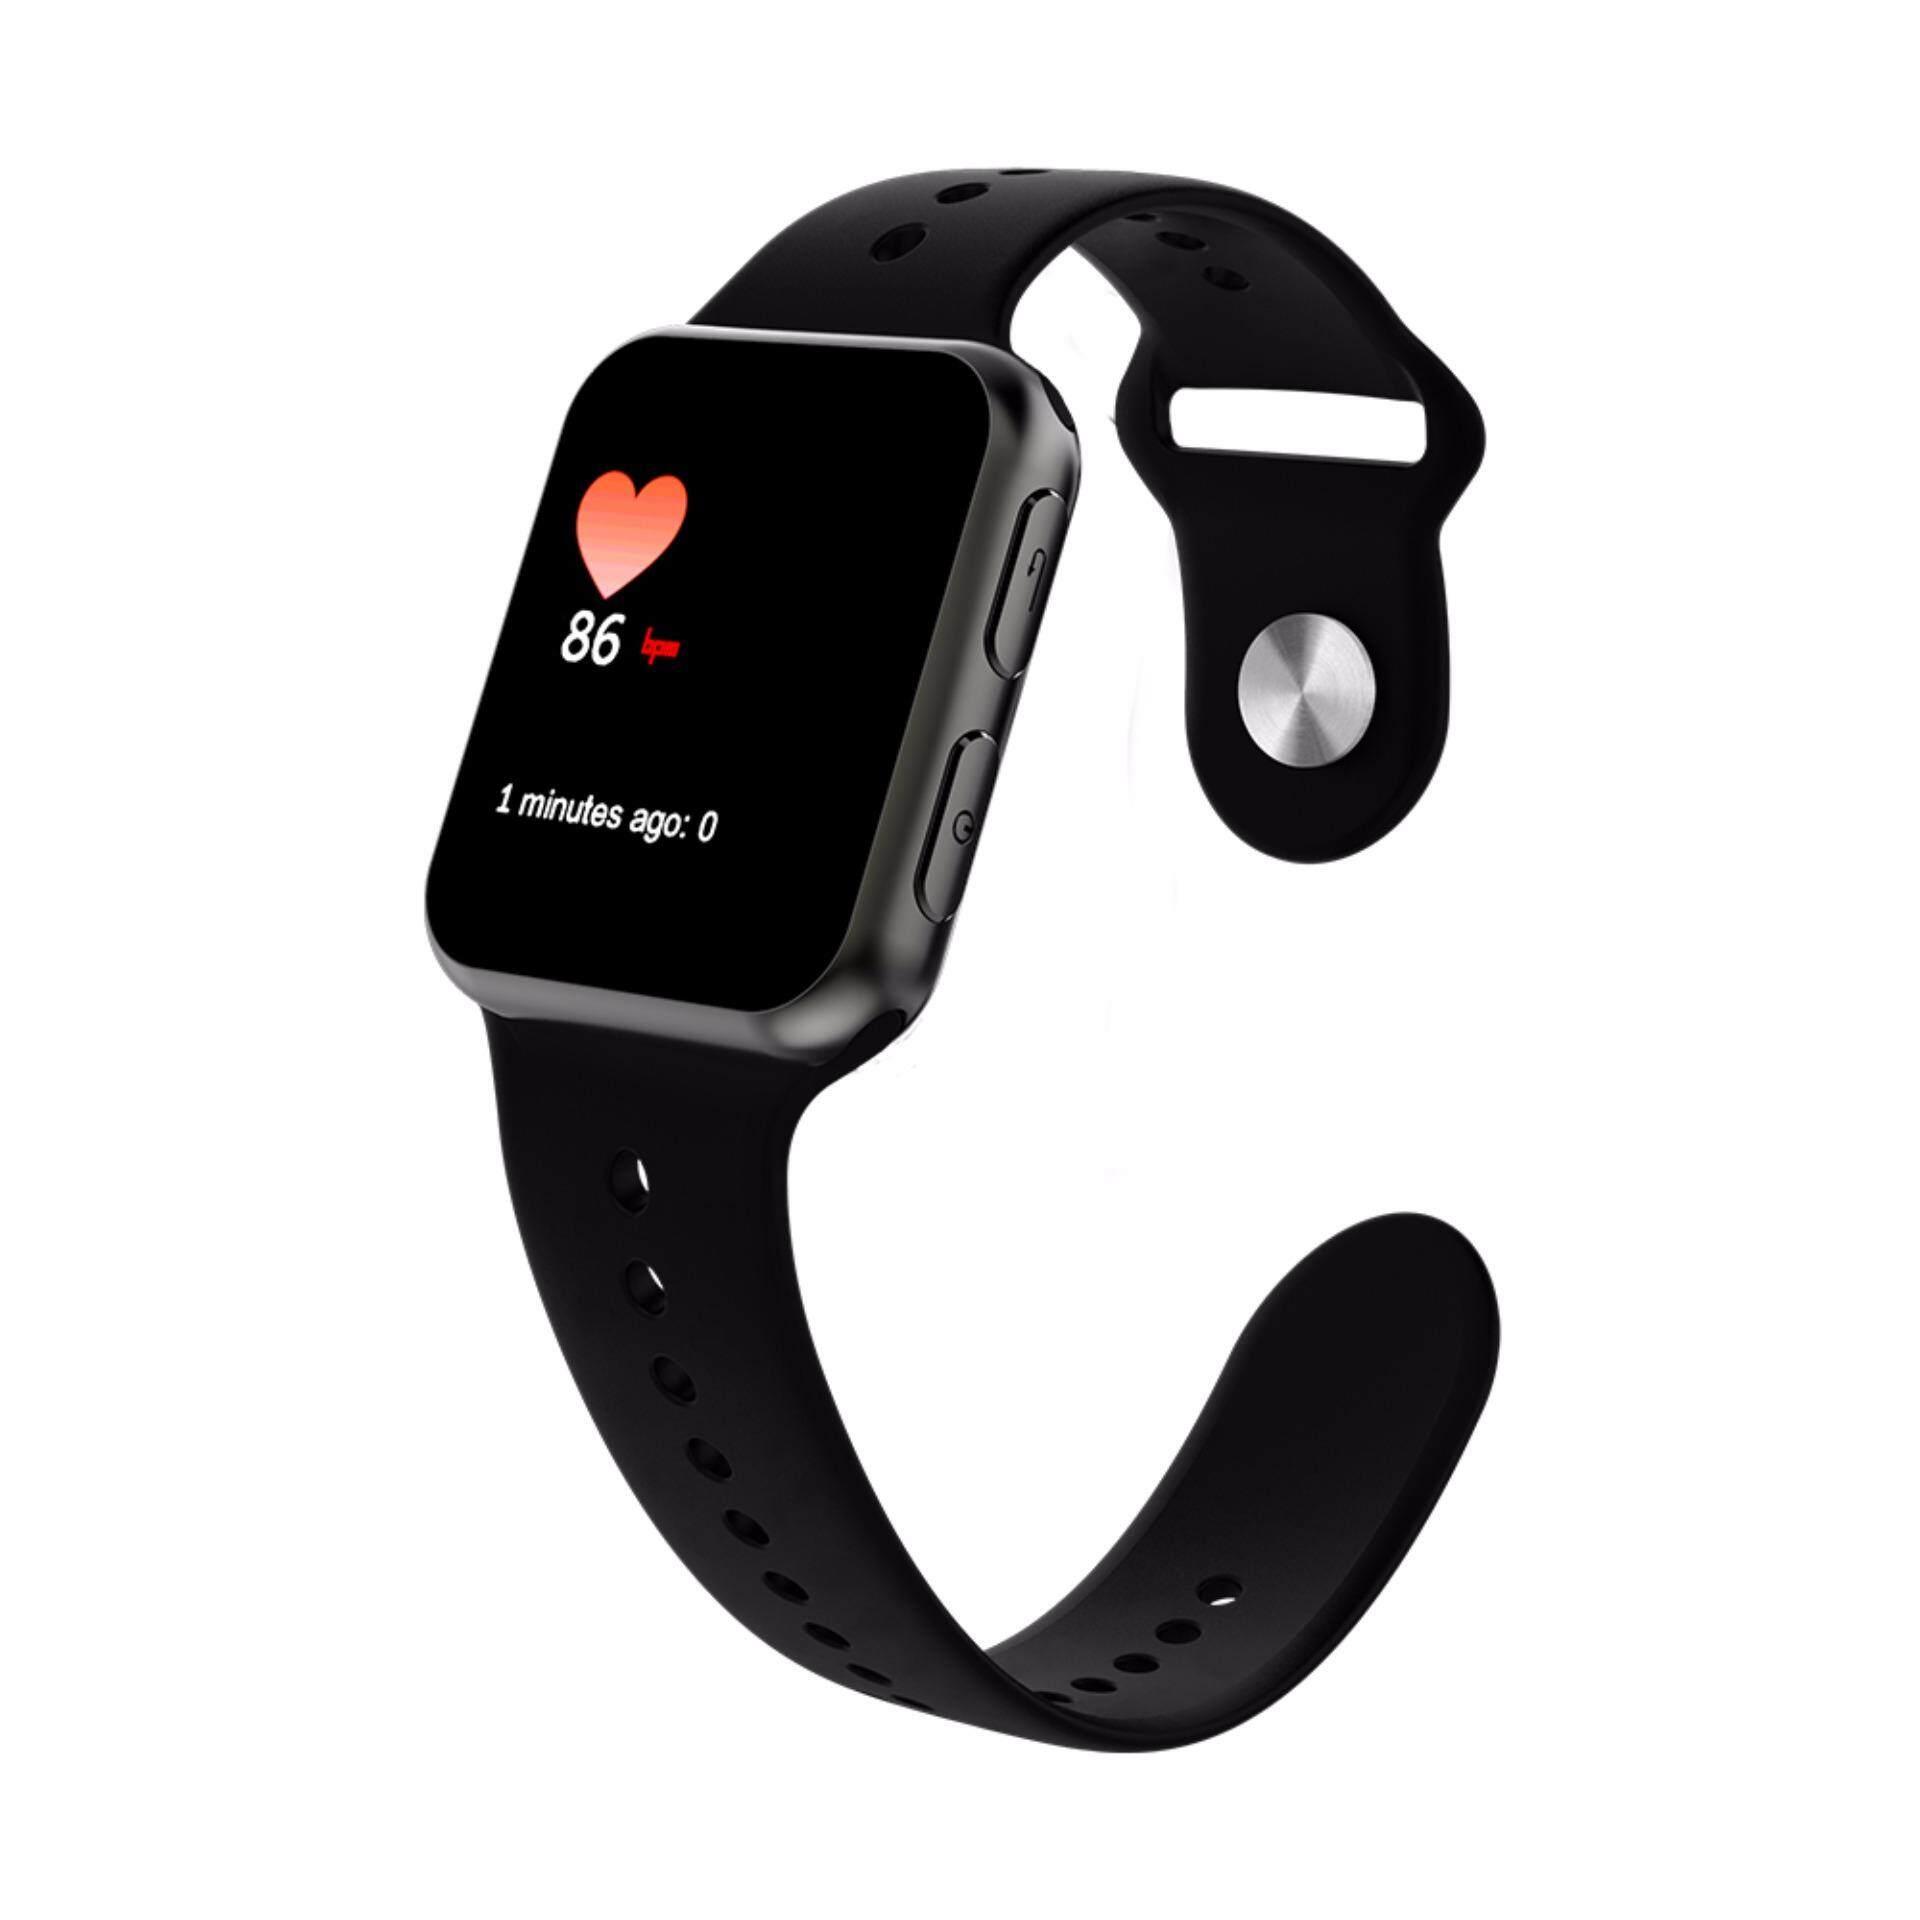 Smawatch Sma 09 2 Bluetooth 40 Jam Pintar Hitam Kulit Band Spovan Gl006 Tangan Olahraga Lari Smartwatch Gps Heartrate Black Smart Watch I68 Mini Mtk2502c With Heart Source Whatsapp Facebook Instagram Pk Iwo